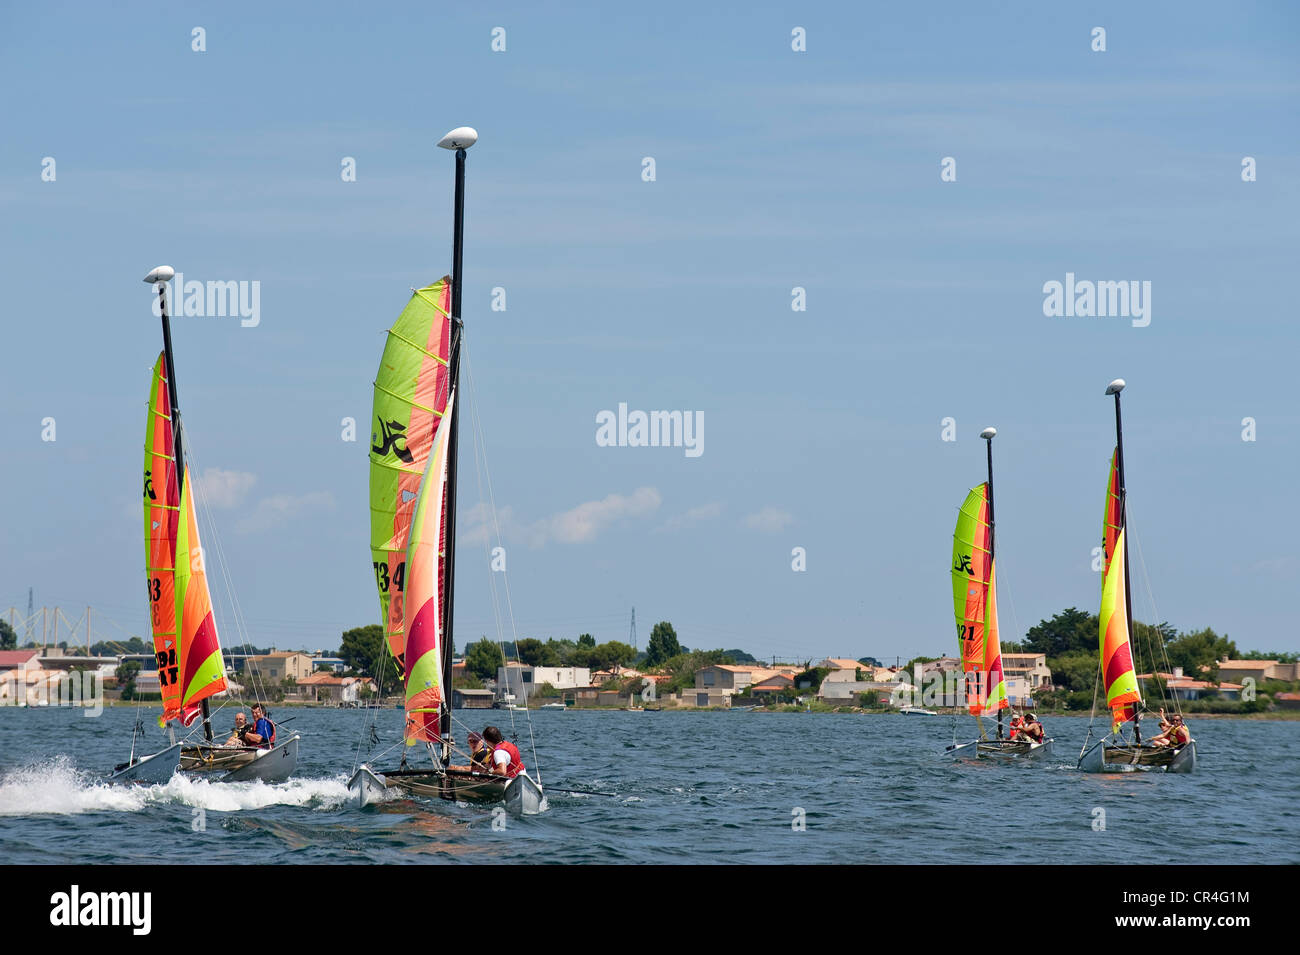 Francia, Herault, Sete, Bassin de Thau, hobbies Cat, regata de catamaranes deportivo pequeño Imagen De Stock